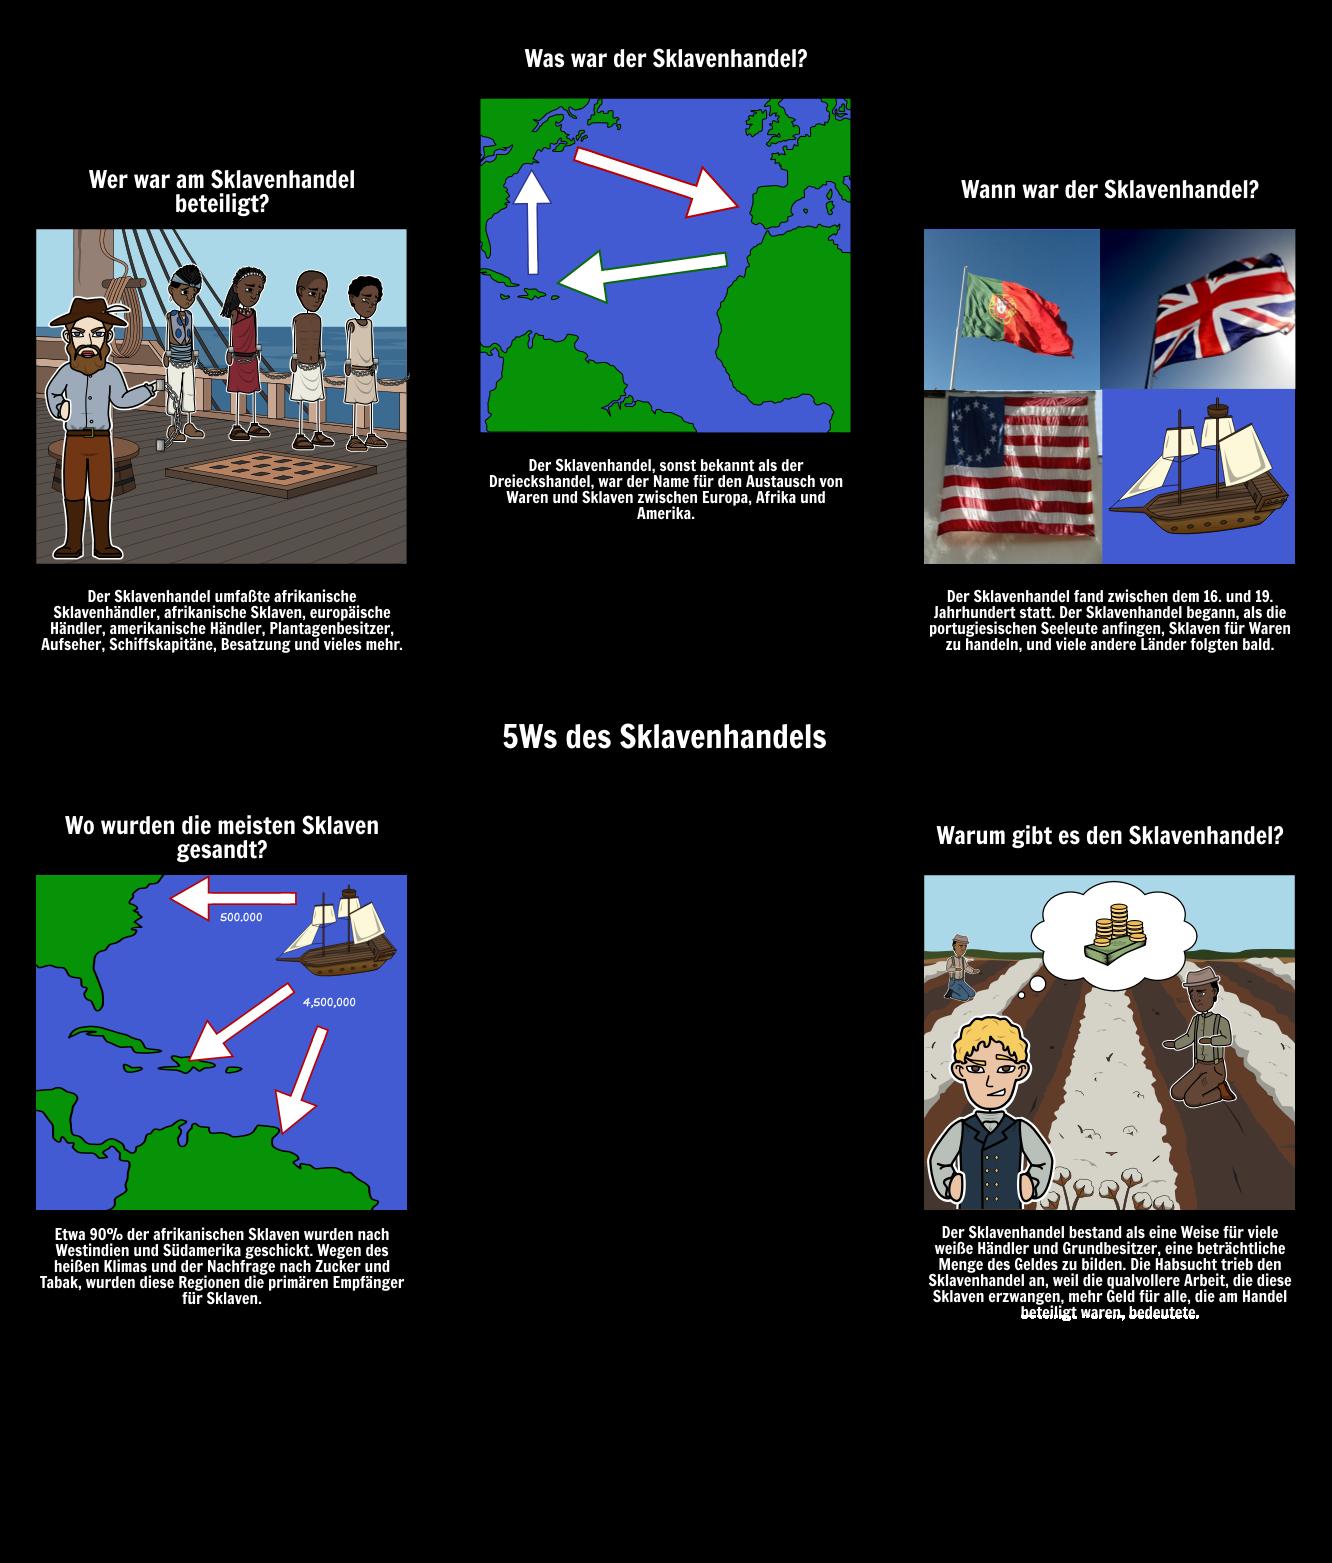 5Ws des Sklavenhandels